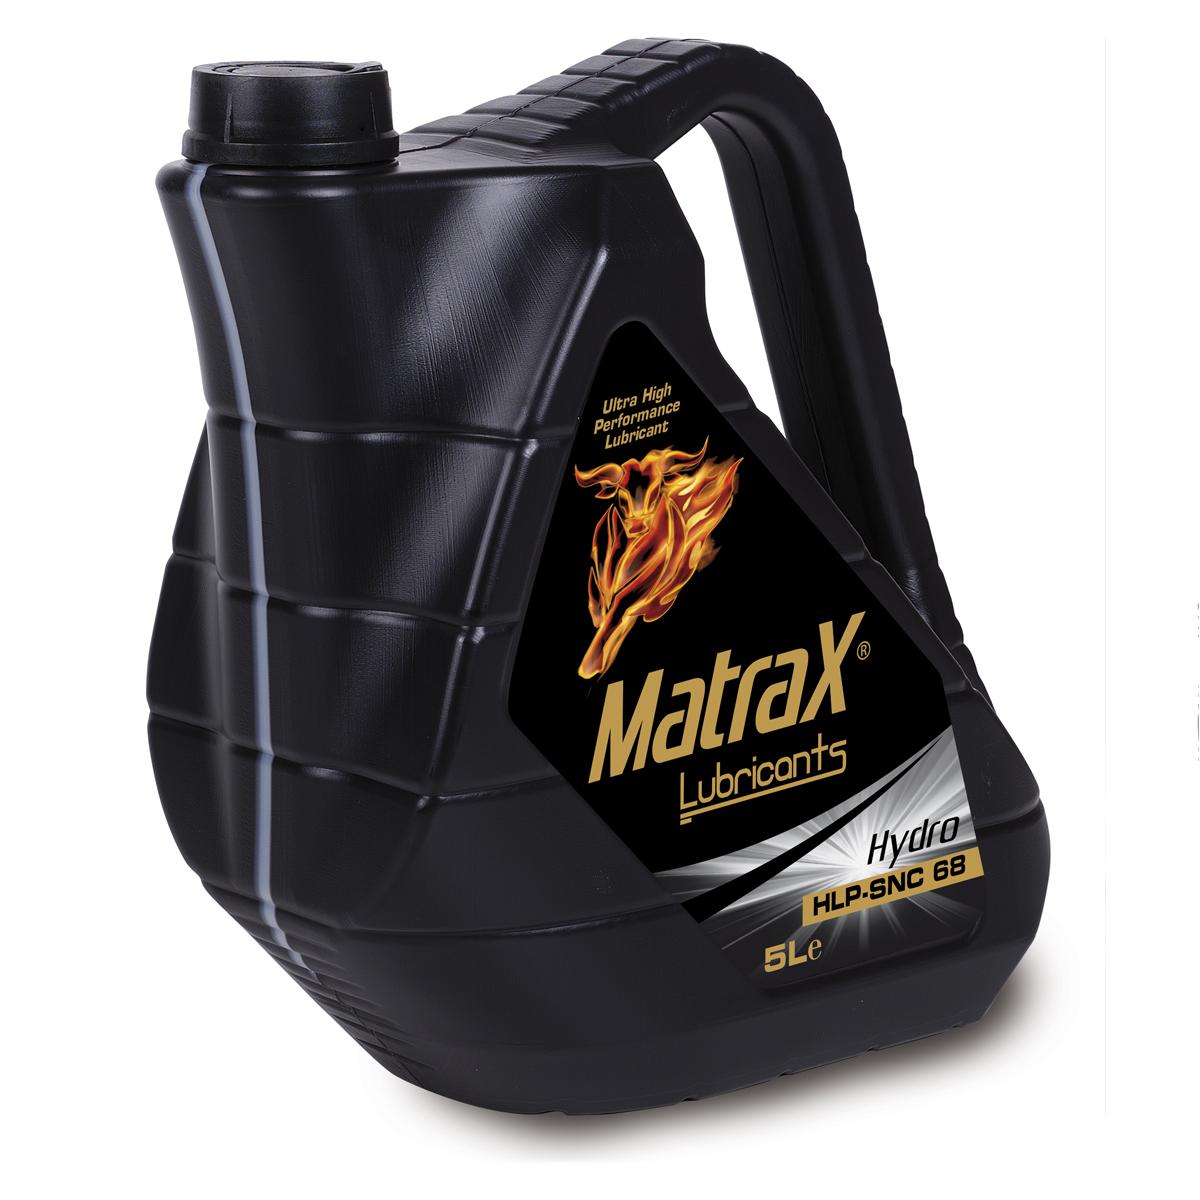 MatraX Hydro HLP Plus 68